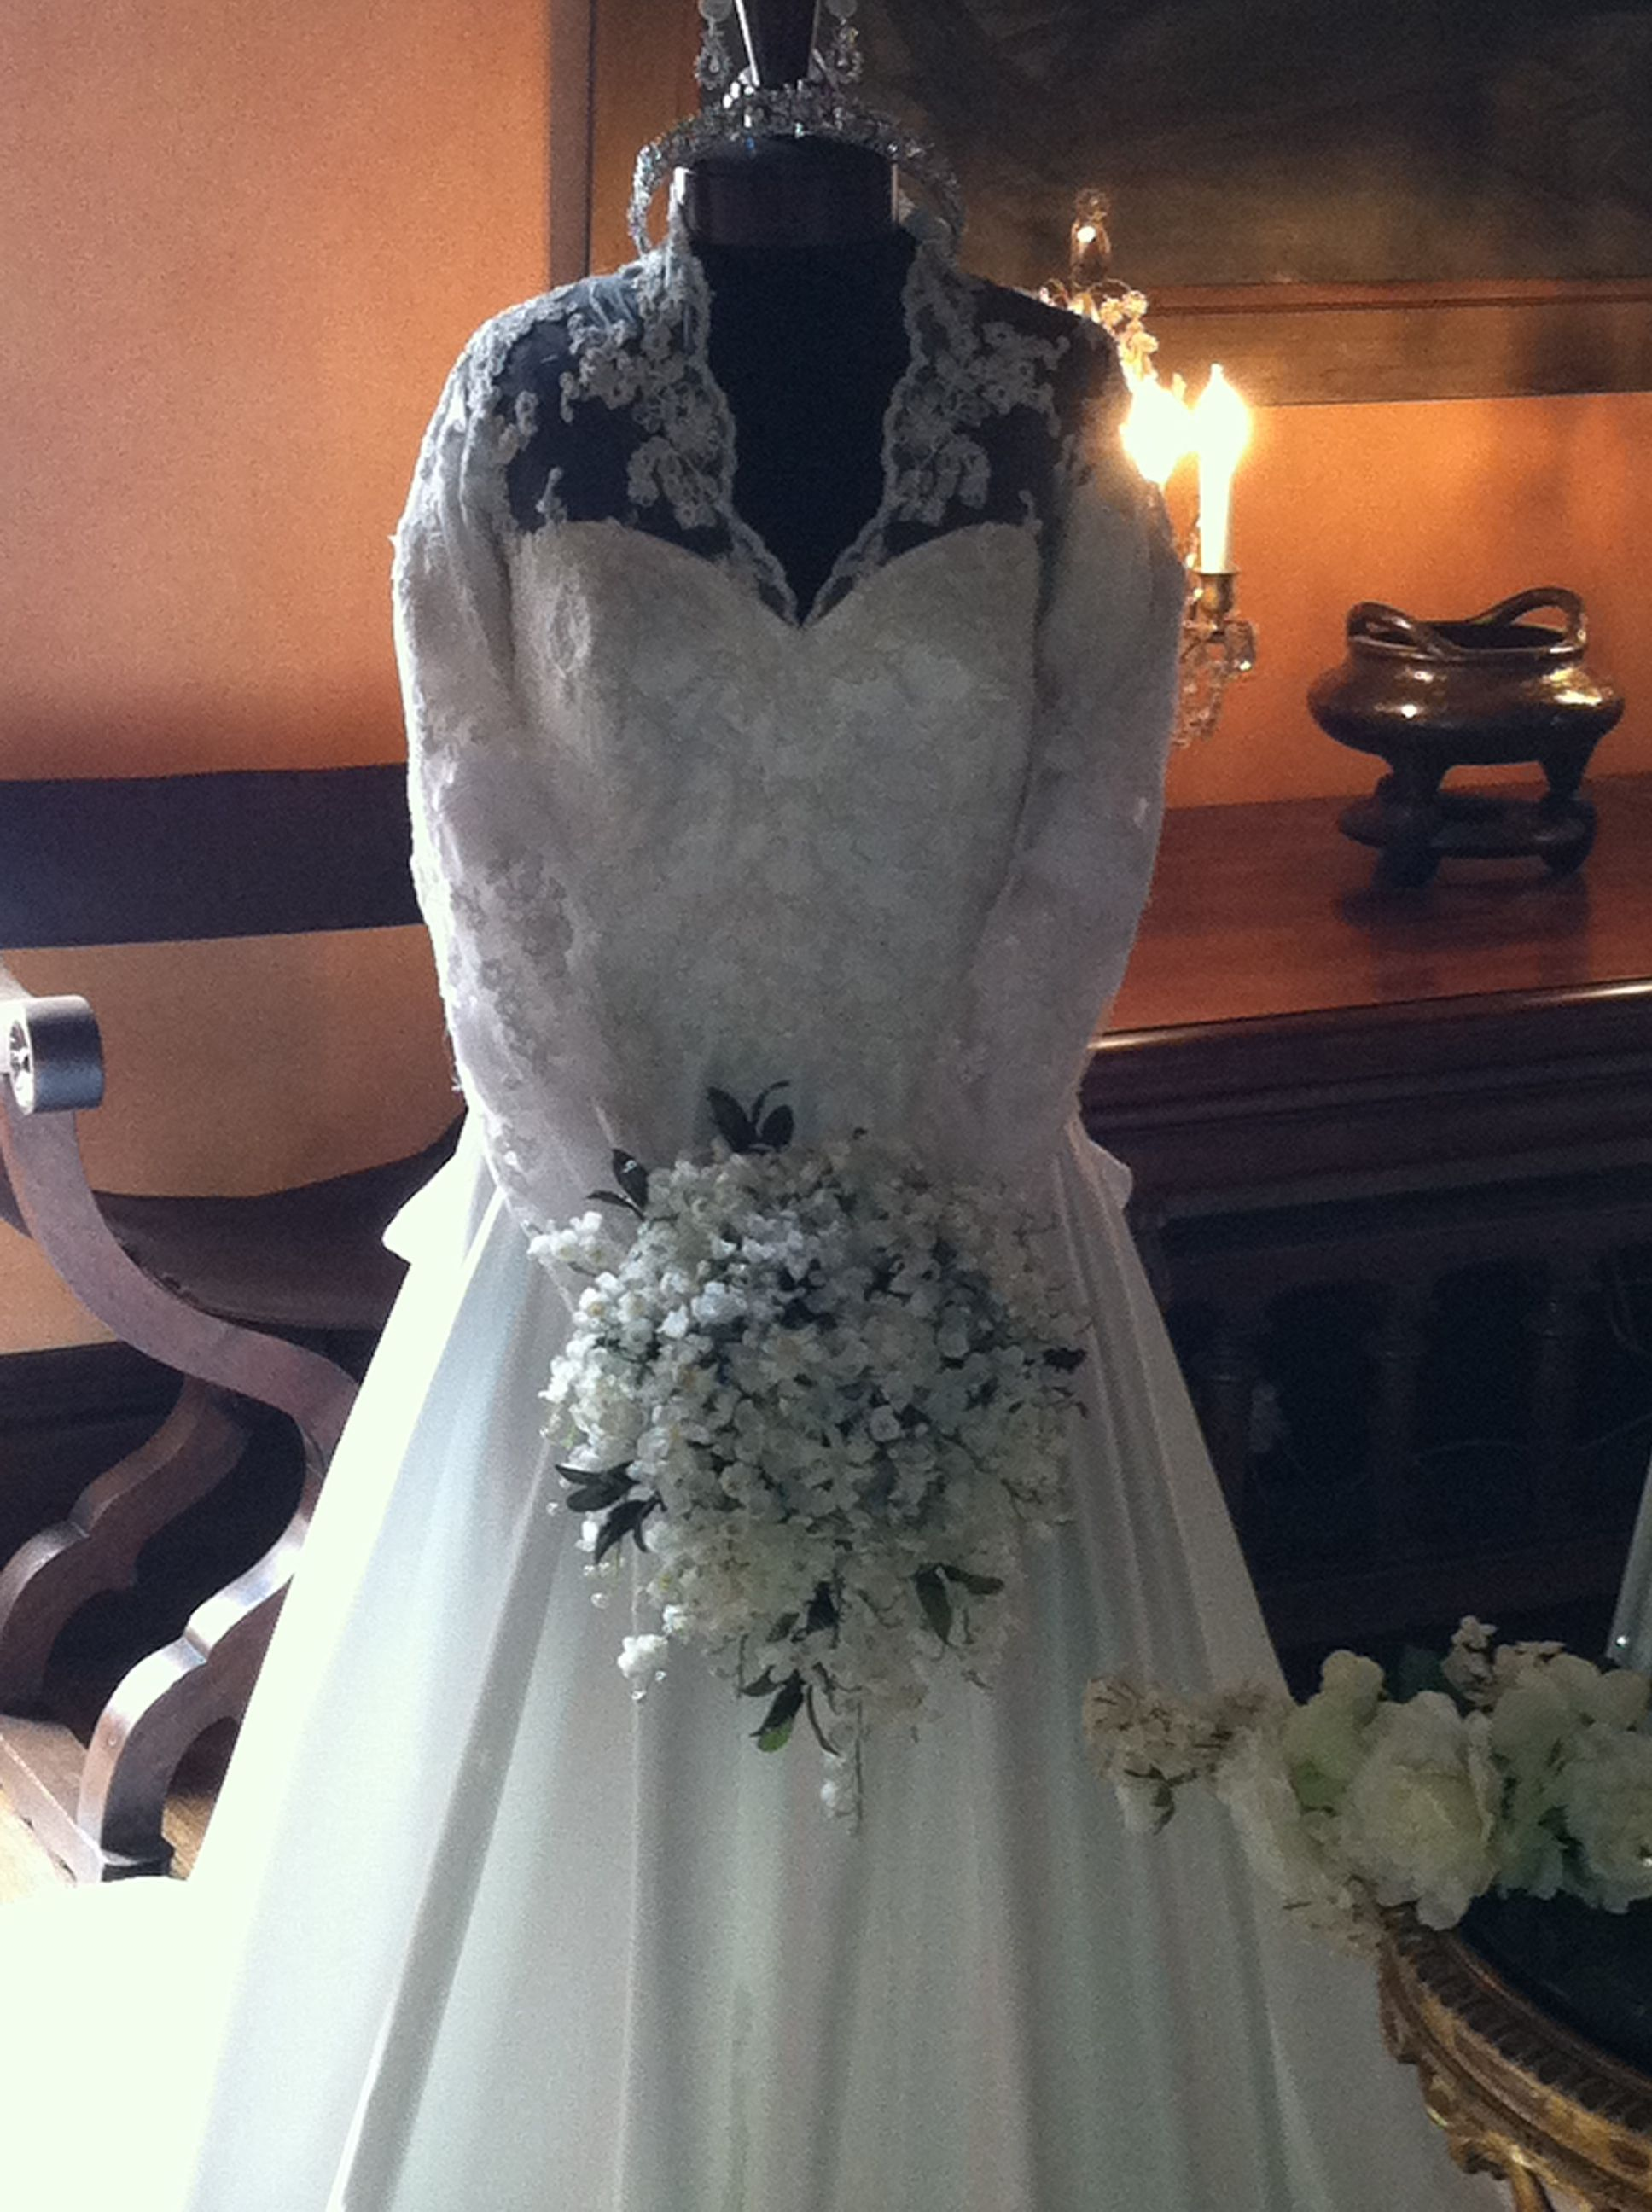 Replica of princess kateus dress wedding fashions through the